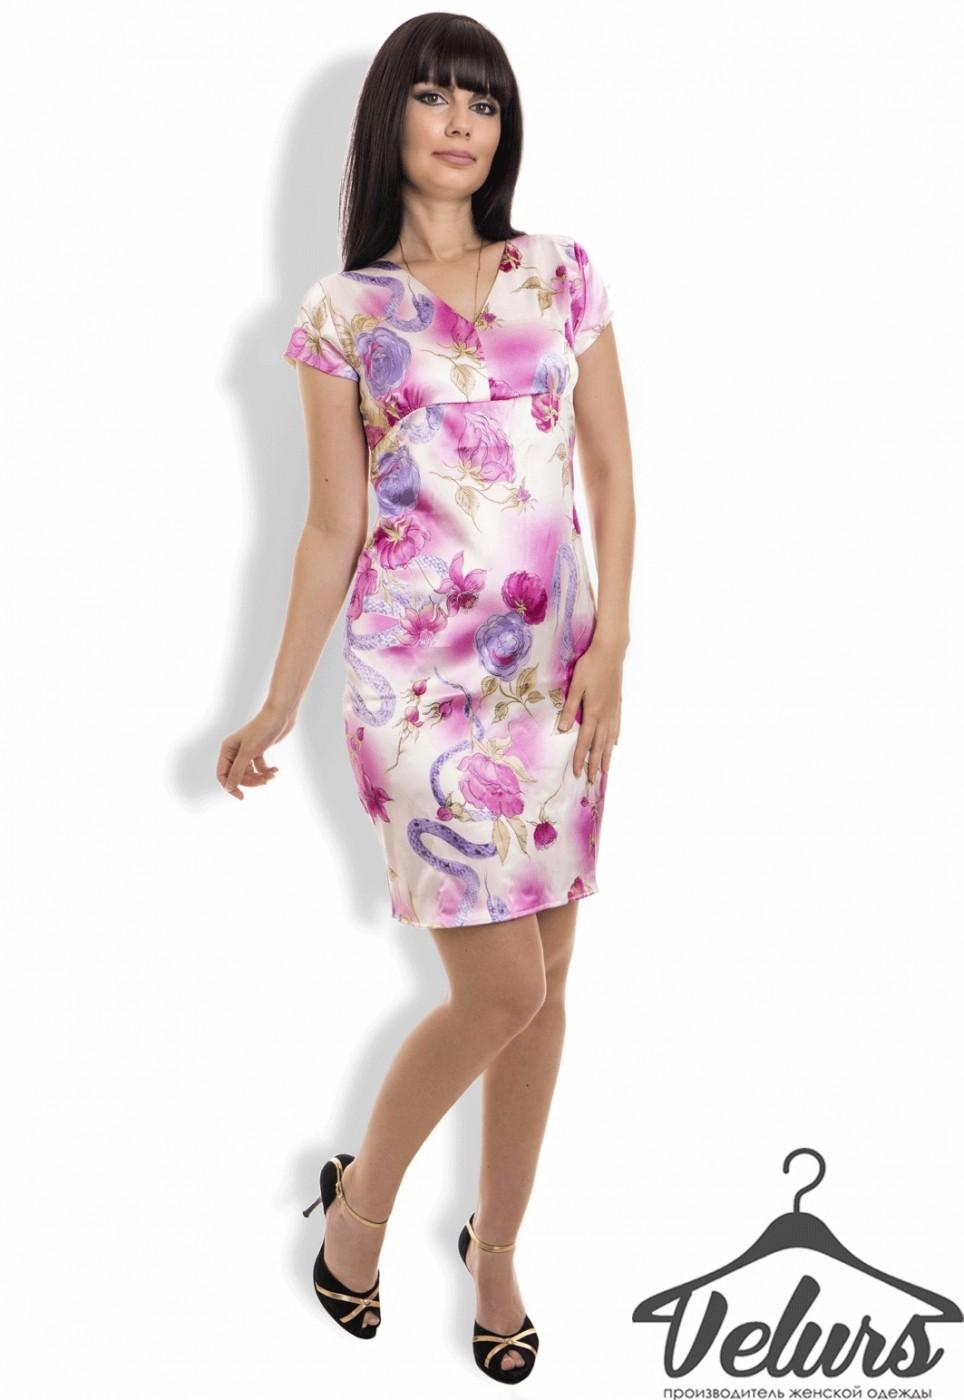 Velurs: Платье 21968 - фото 1